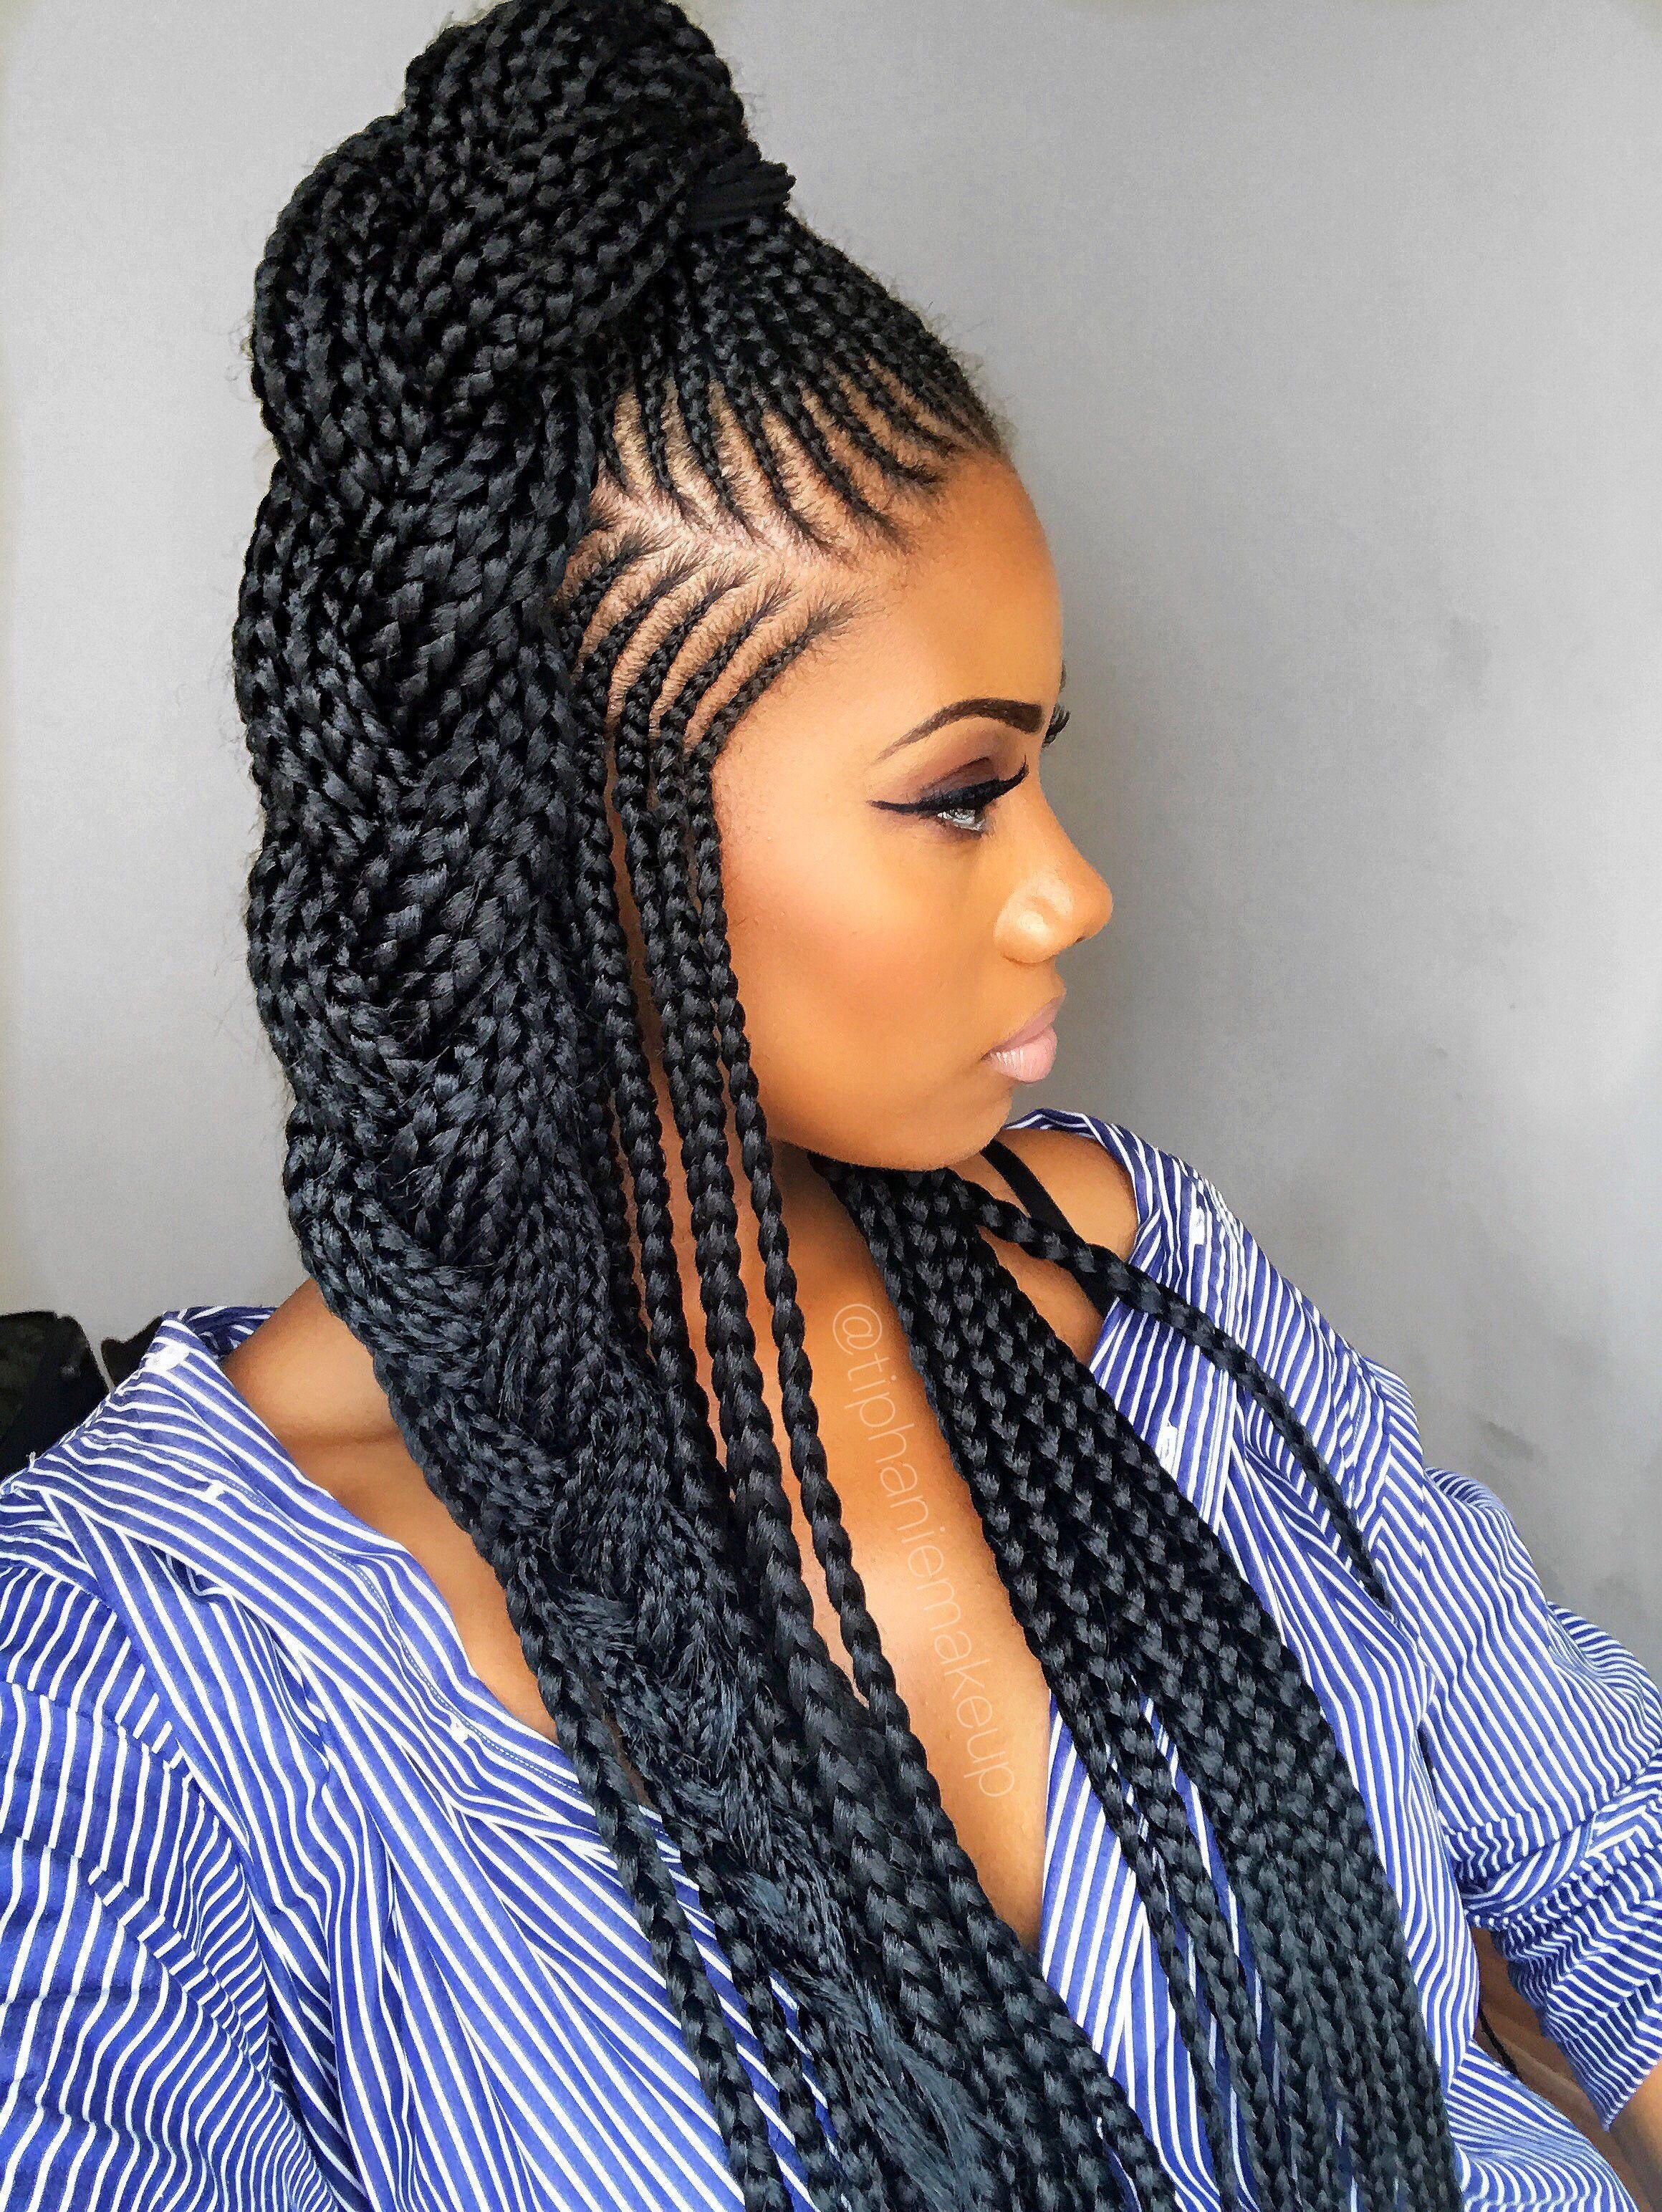 22 Beautiful African Braid Updo Hairstyles African Braiding Style African Braids Af Braided Hairstyles Updo Cornrow Hairstyles African Hair Braiding Styles